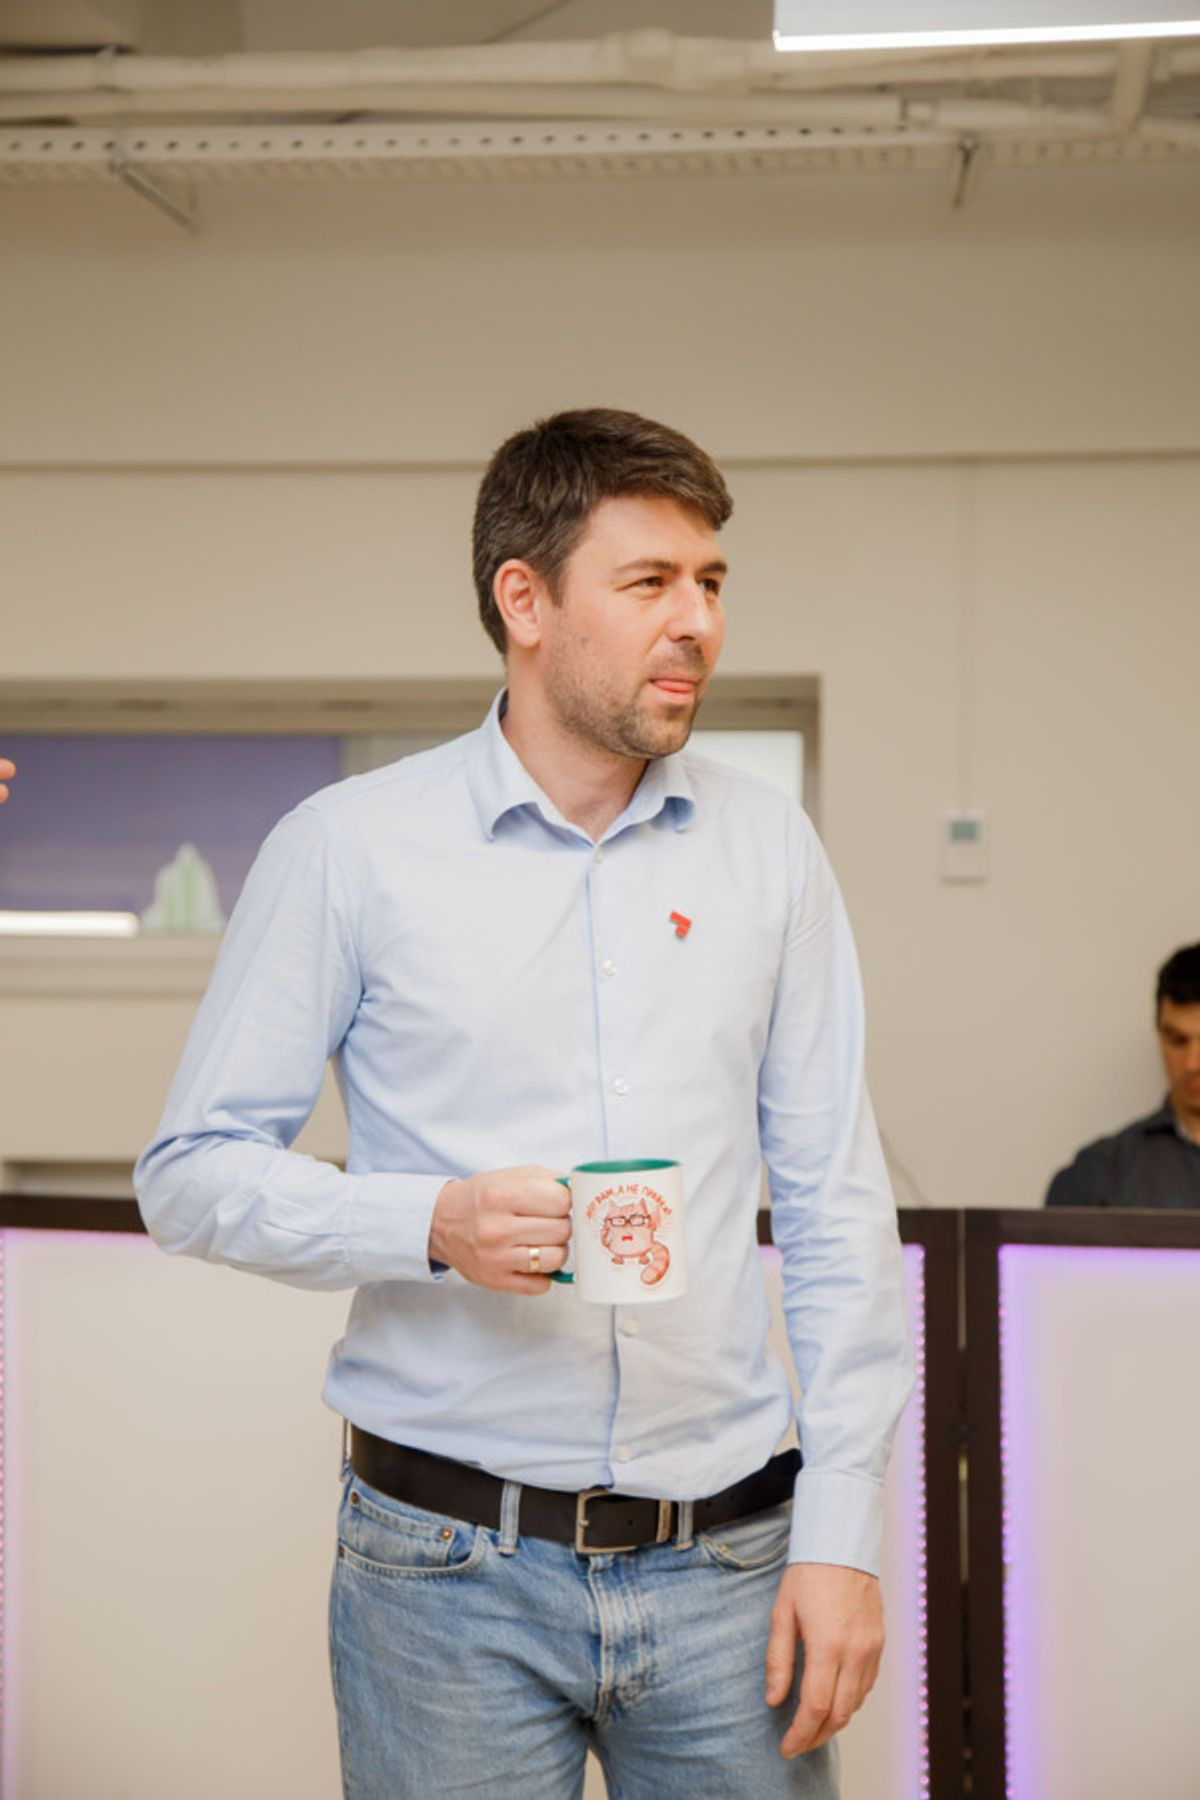 Photo of Dmytro Dvurechenskyi, Vice President at OpenGeeksLab